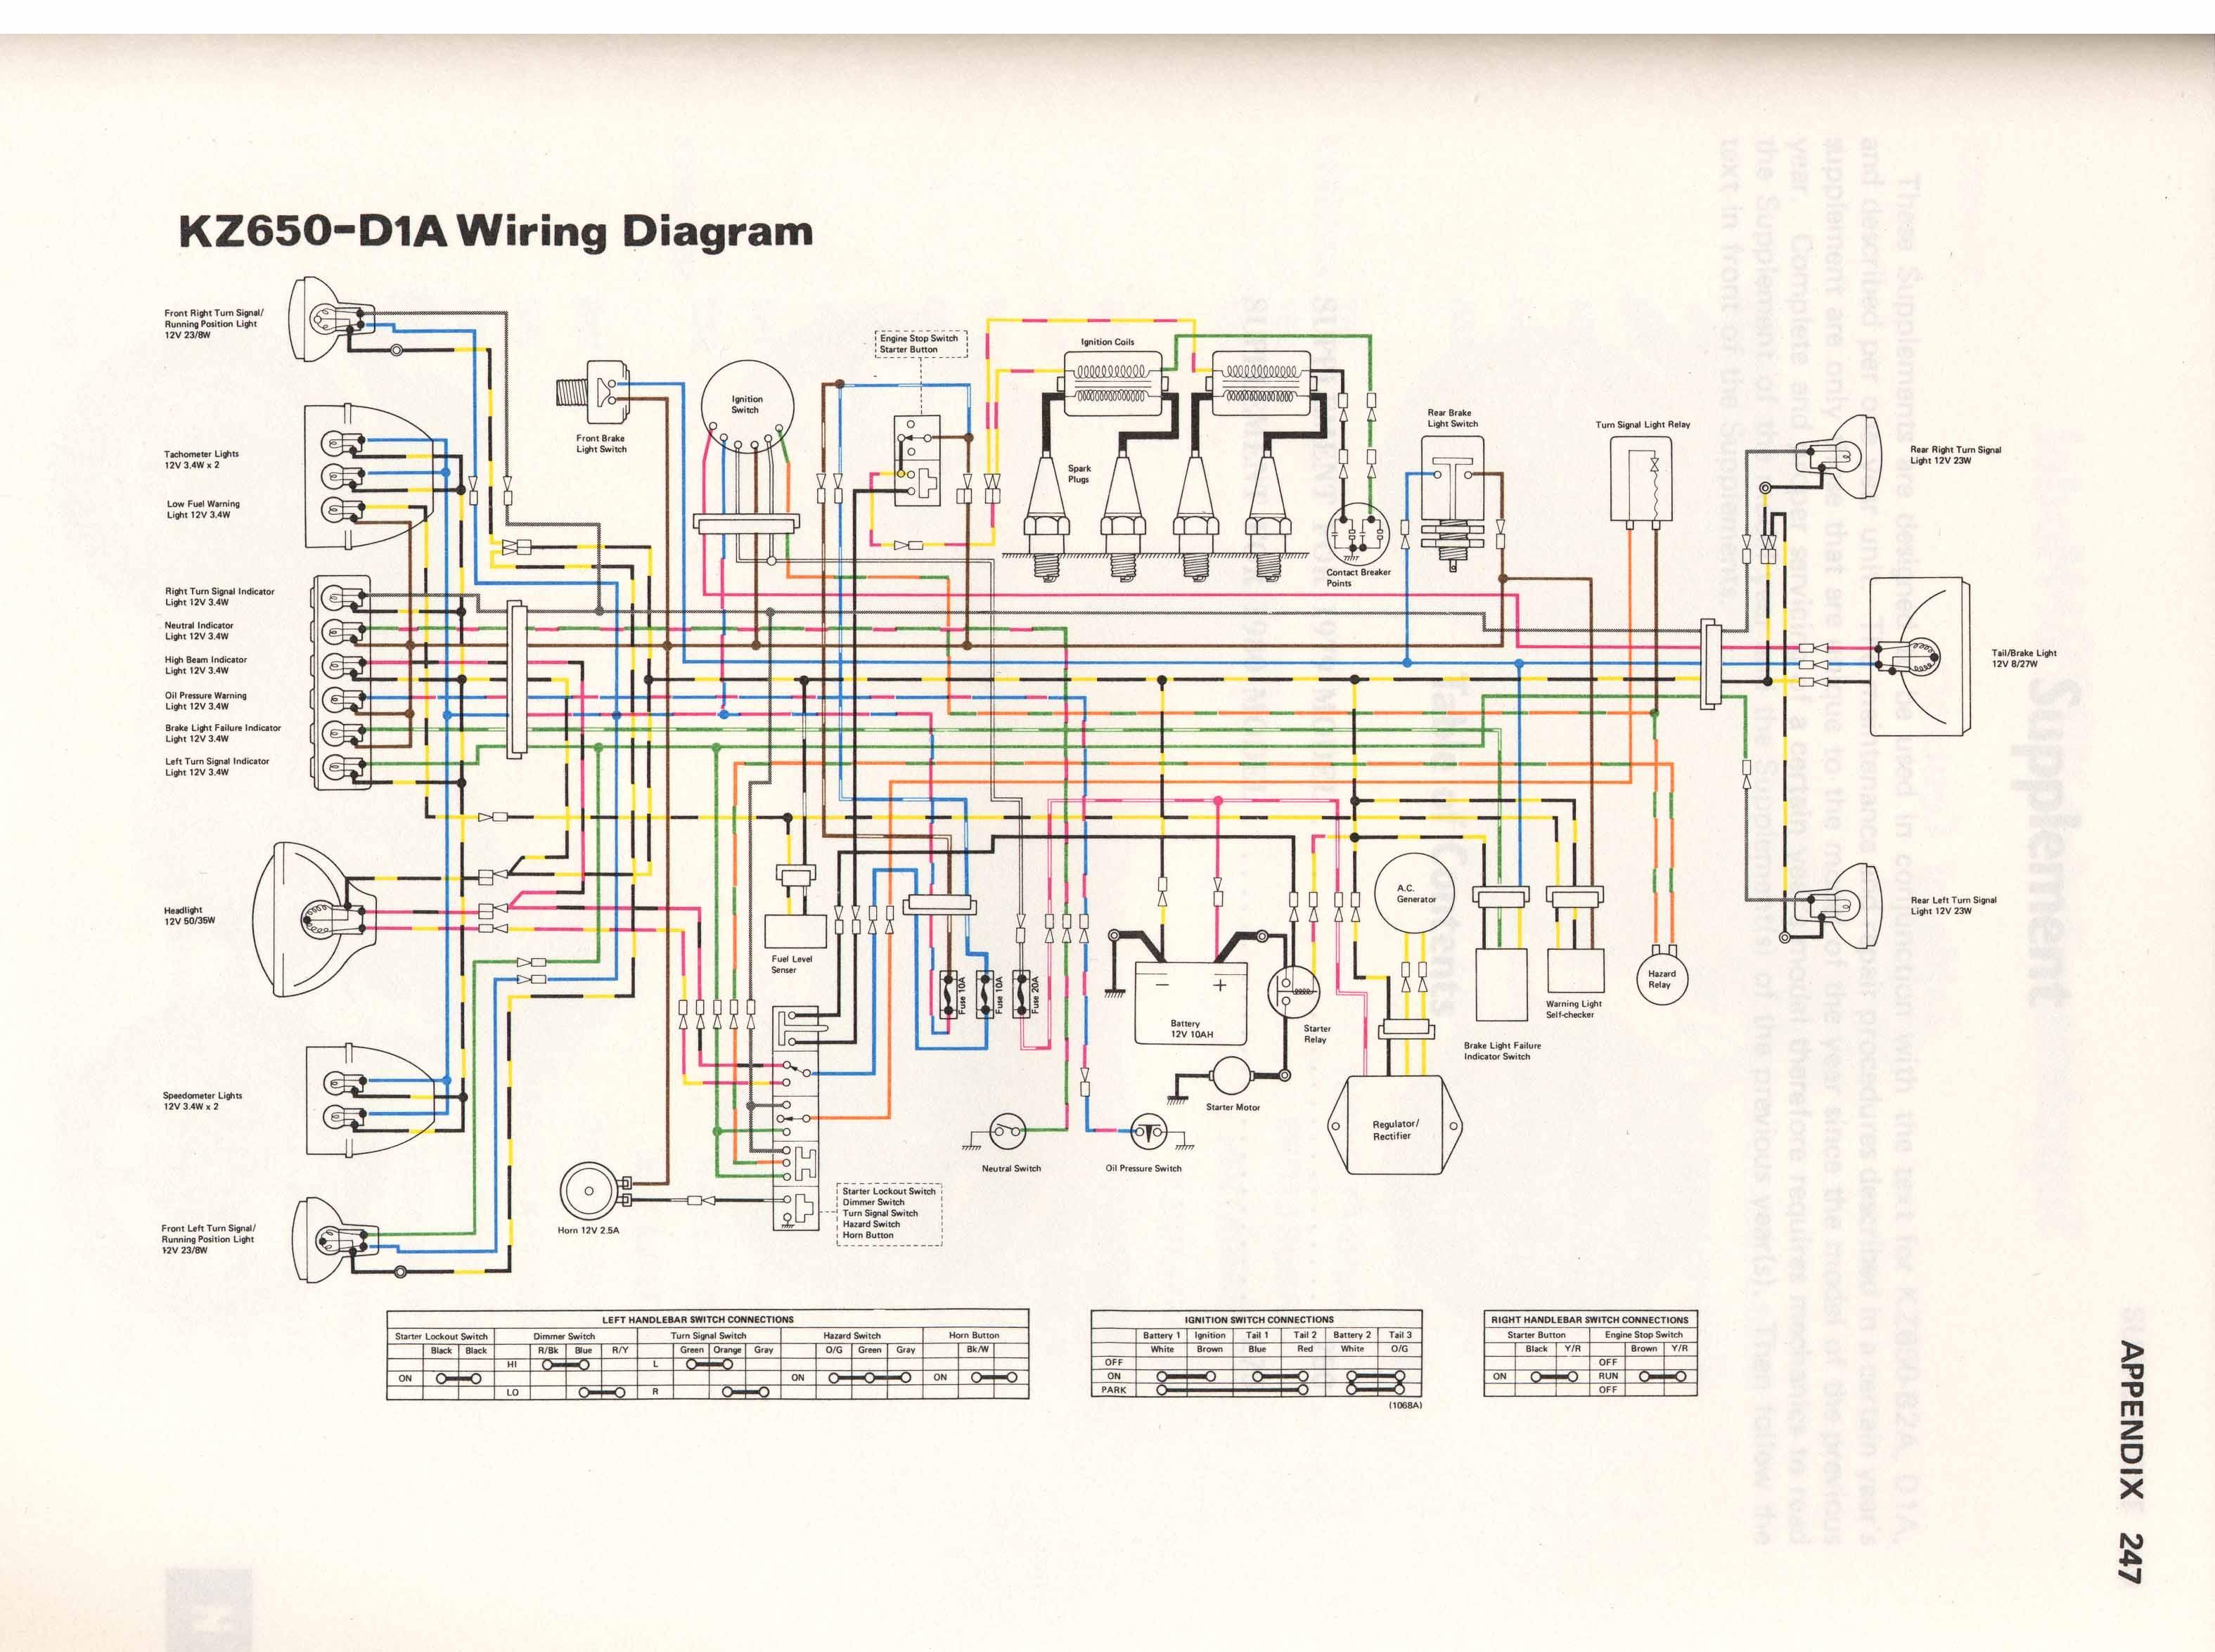 1980 F350 Wiring Diagram Alt Library Moreover Mercruiser On Chevy Alternator Kz750 80 Schematics Diagrams U2022 Ford Truck 76 Ltd